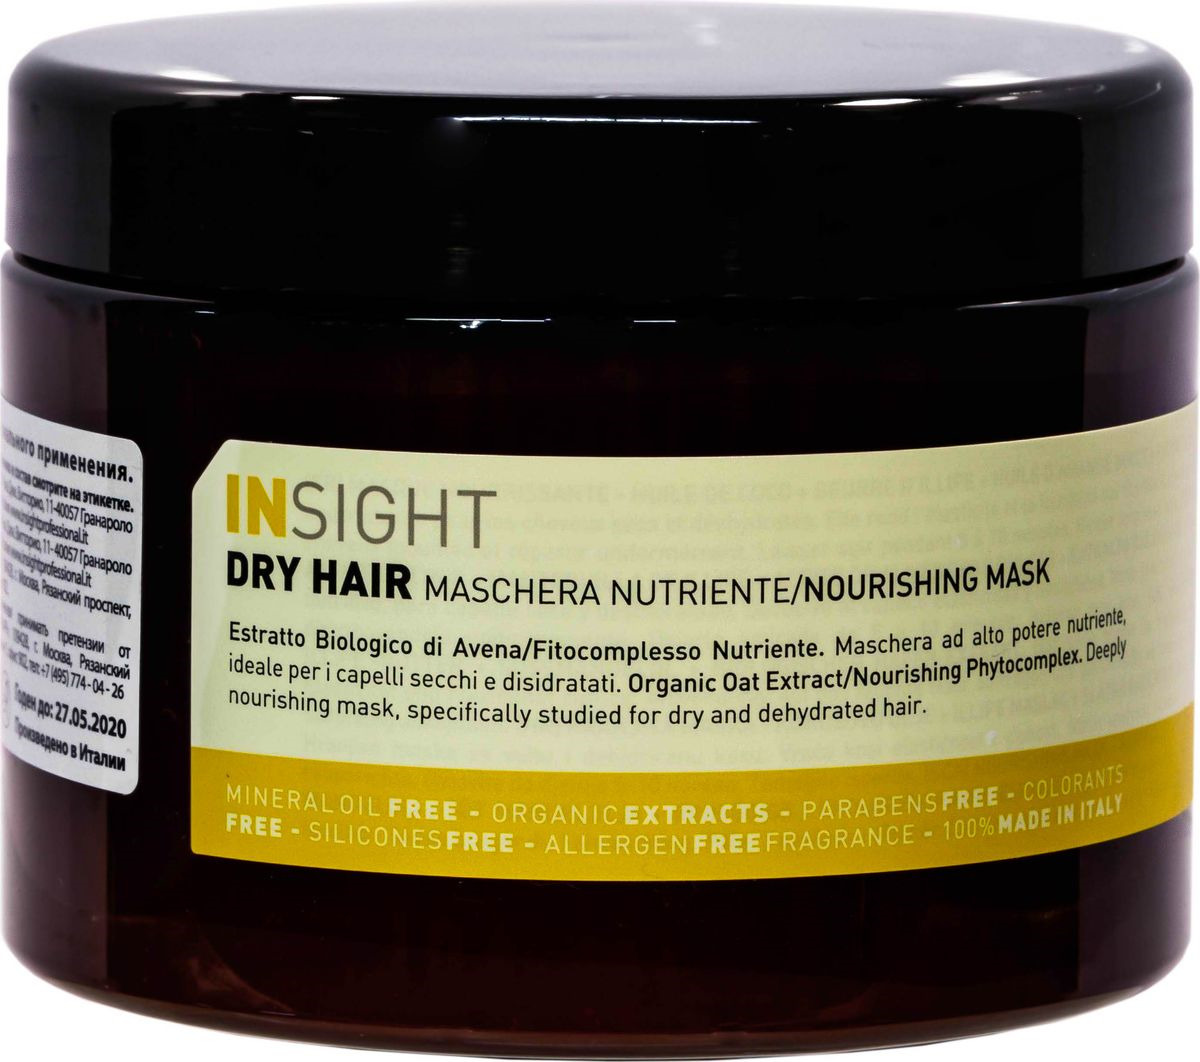 Увлажняющая маска для сухих волос Insight Dry Hair, 500 мл